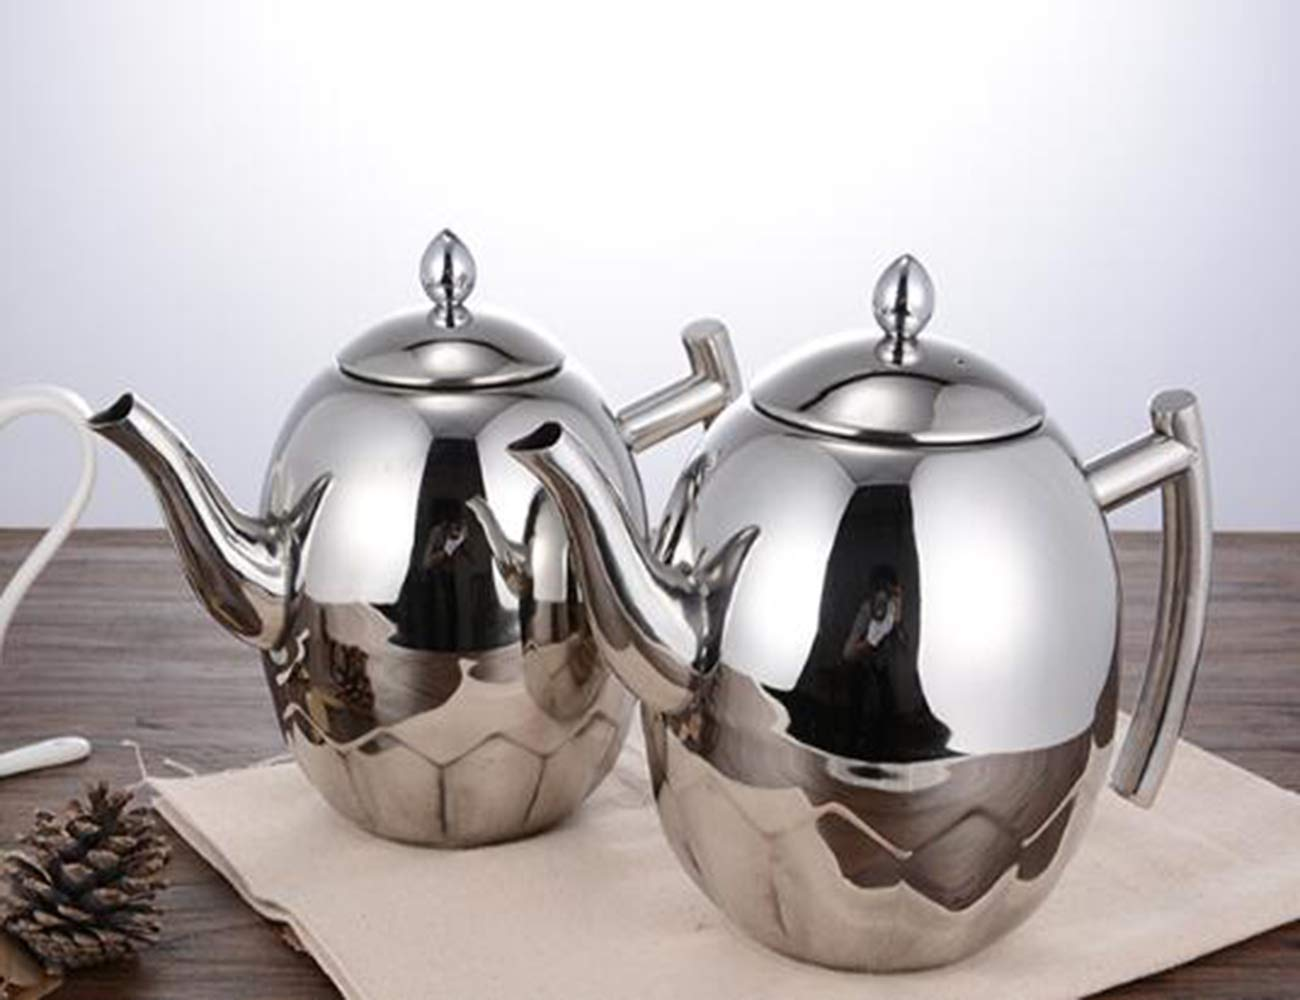 Amazon.com: Tetera de acero inoxidable, diseño de oliva ...